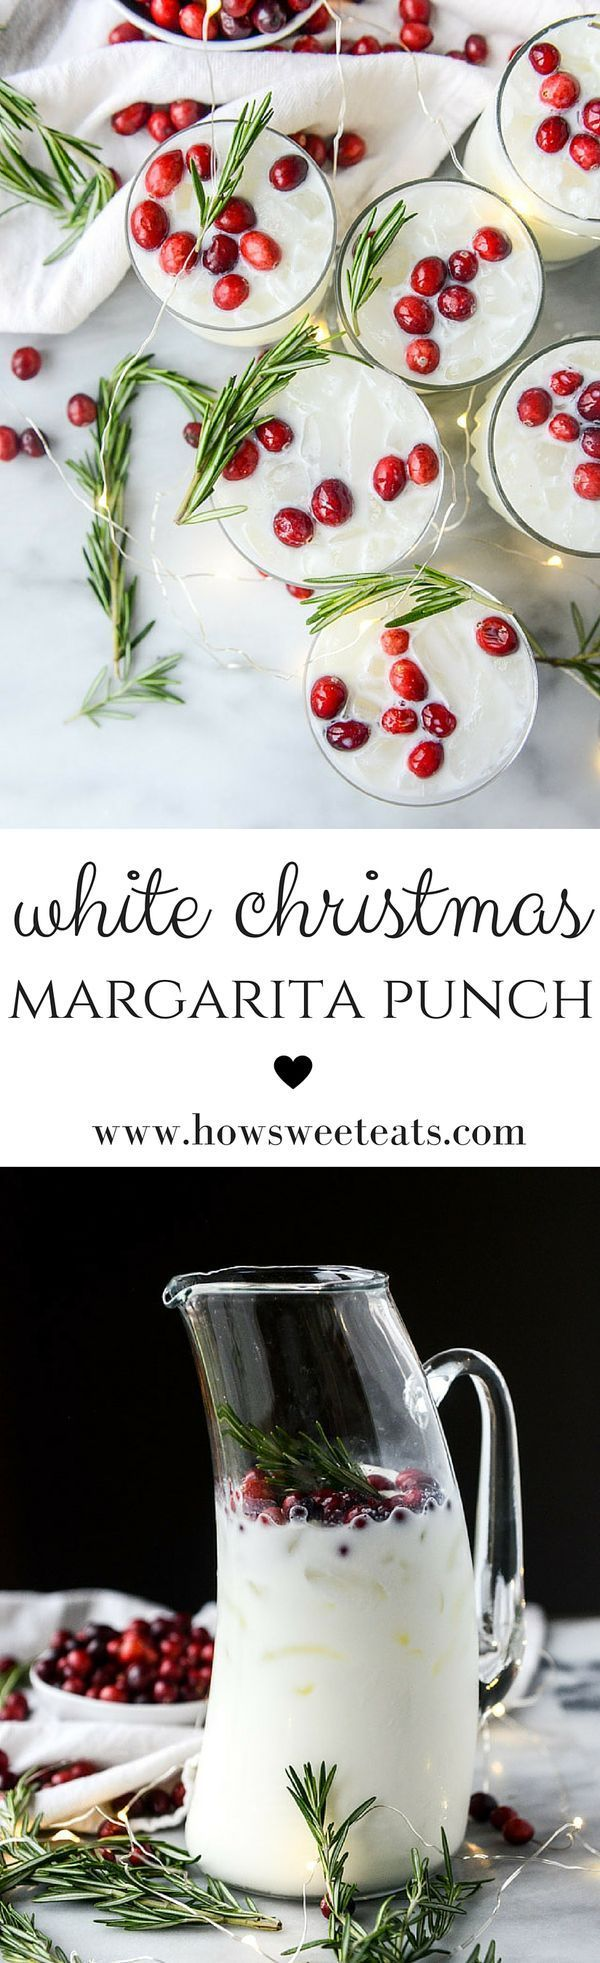 white christmas margarita punch I howsweeteats.com